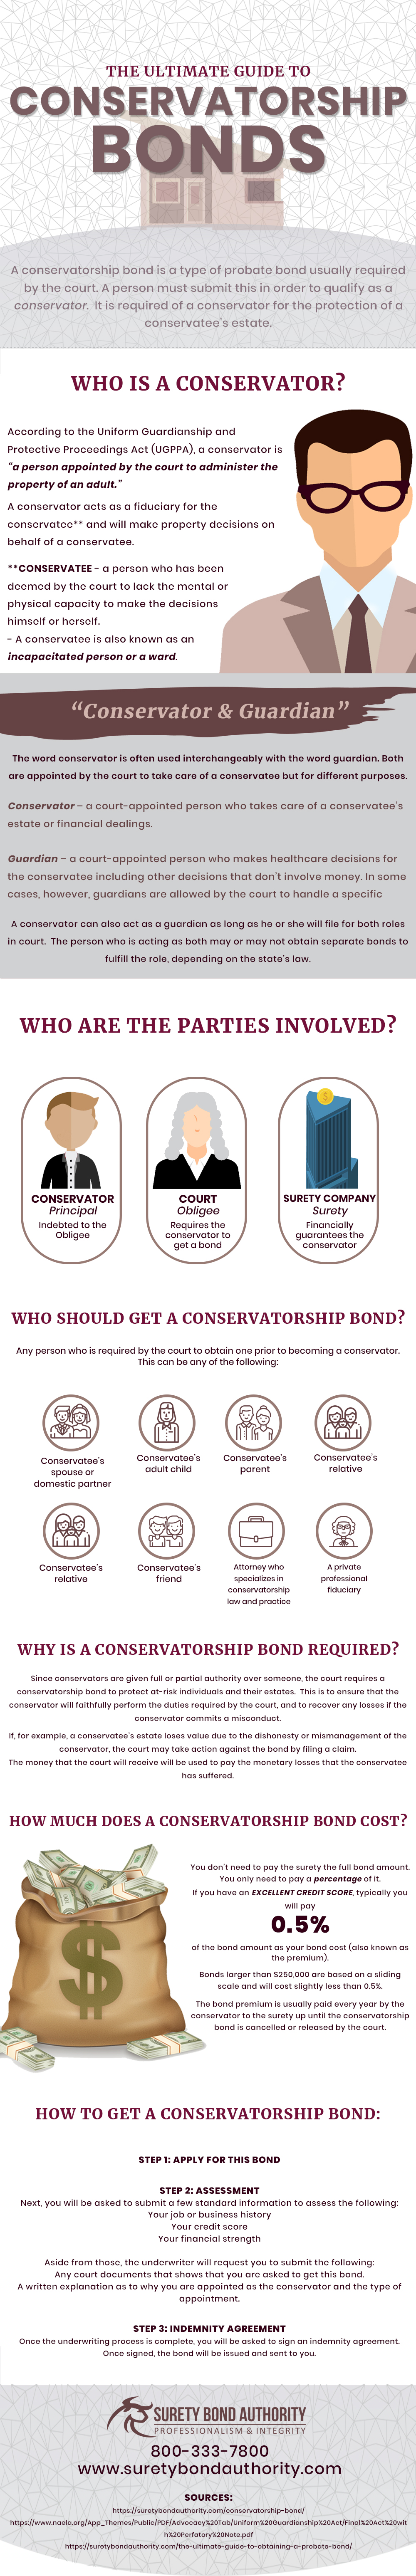 Conservatorship Bonds Infographic